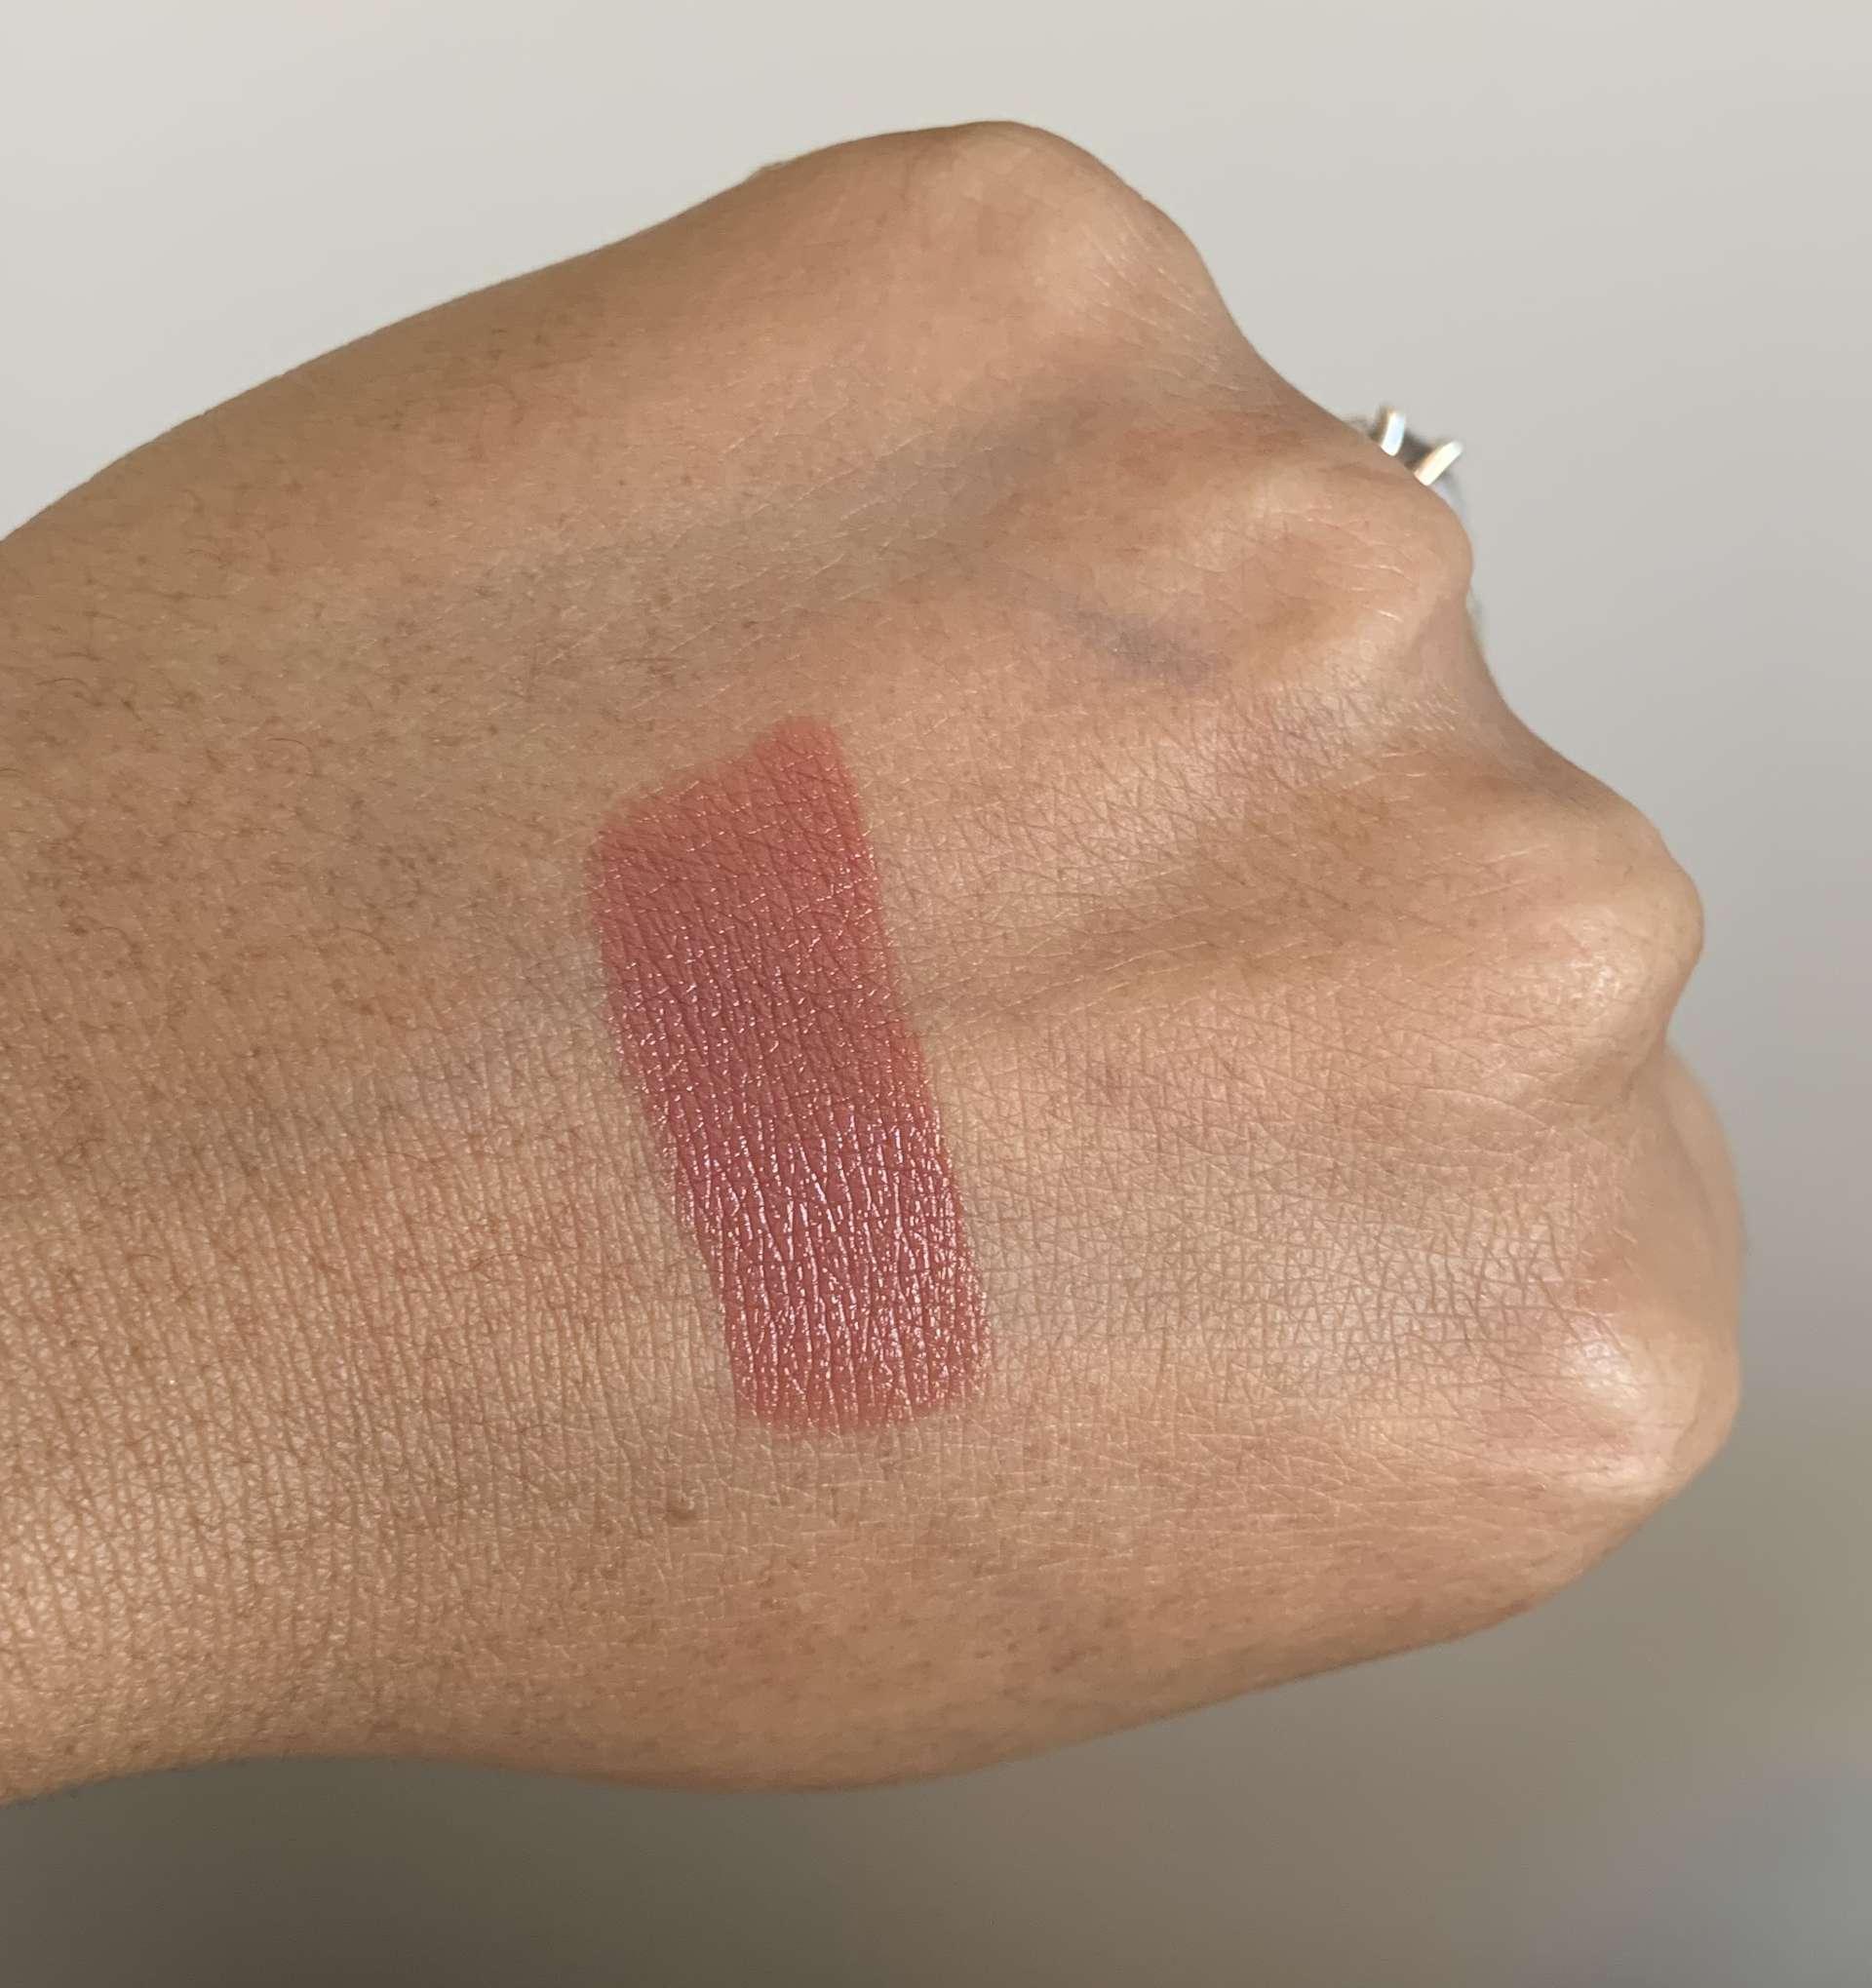 Bobbi Brown Luxe Lip Color Swatches on medium dark skin (Bahama Brown, Downtown Plum, Pink Buff)